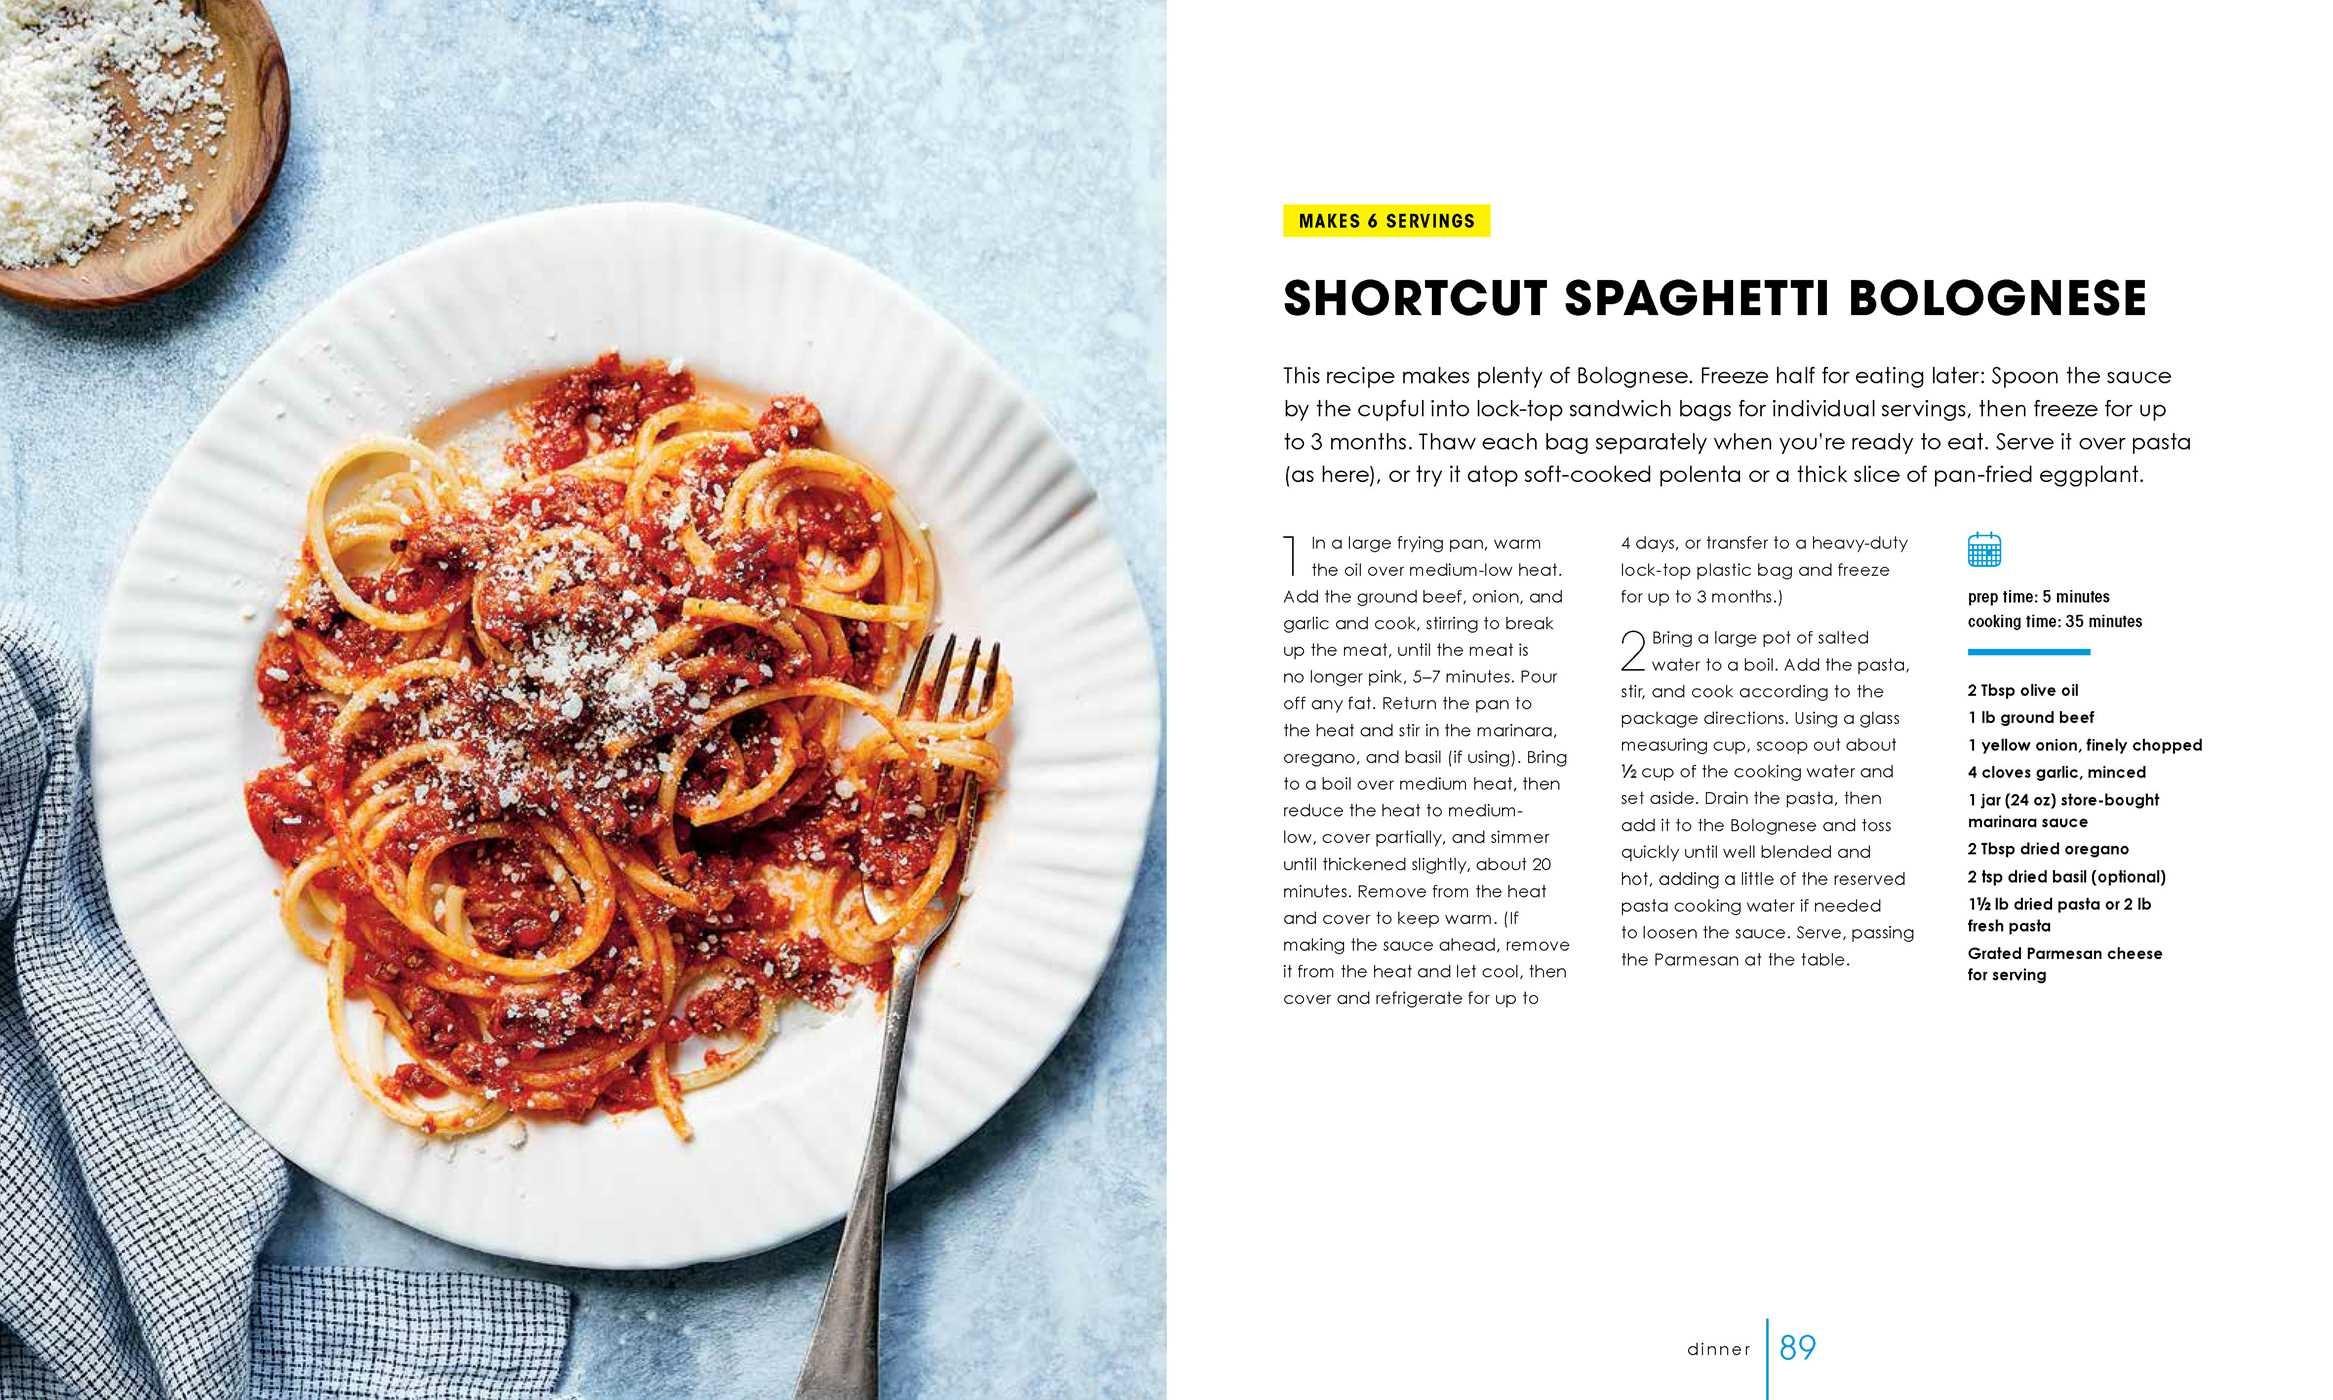 The college cookbook 9781681884363.in06